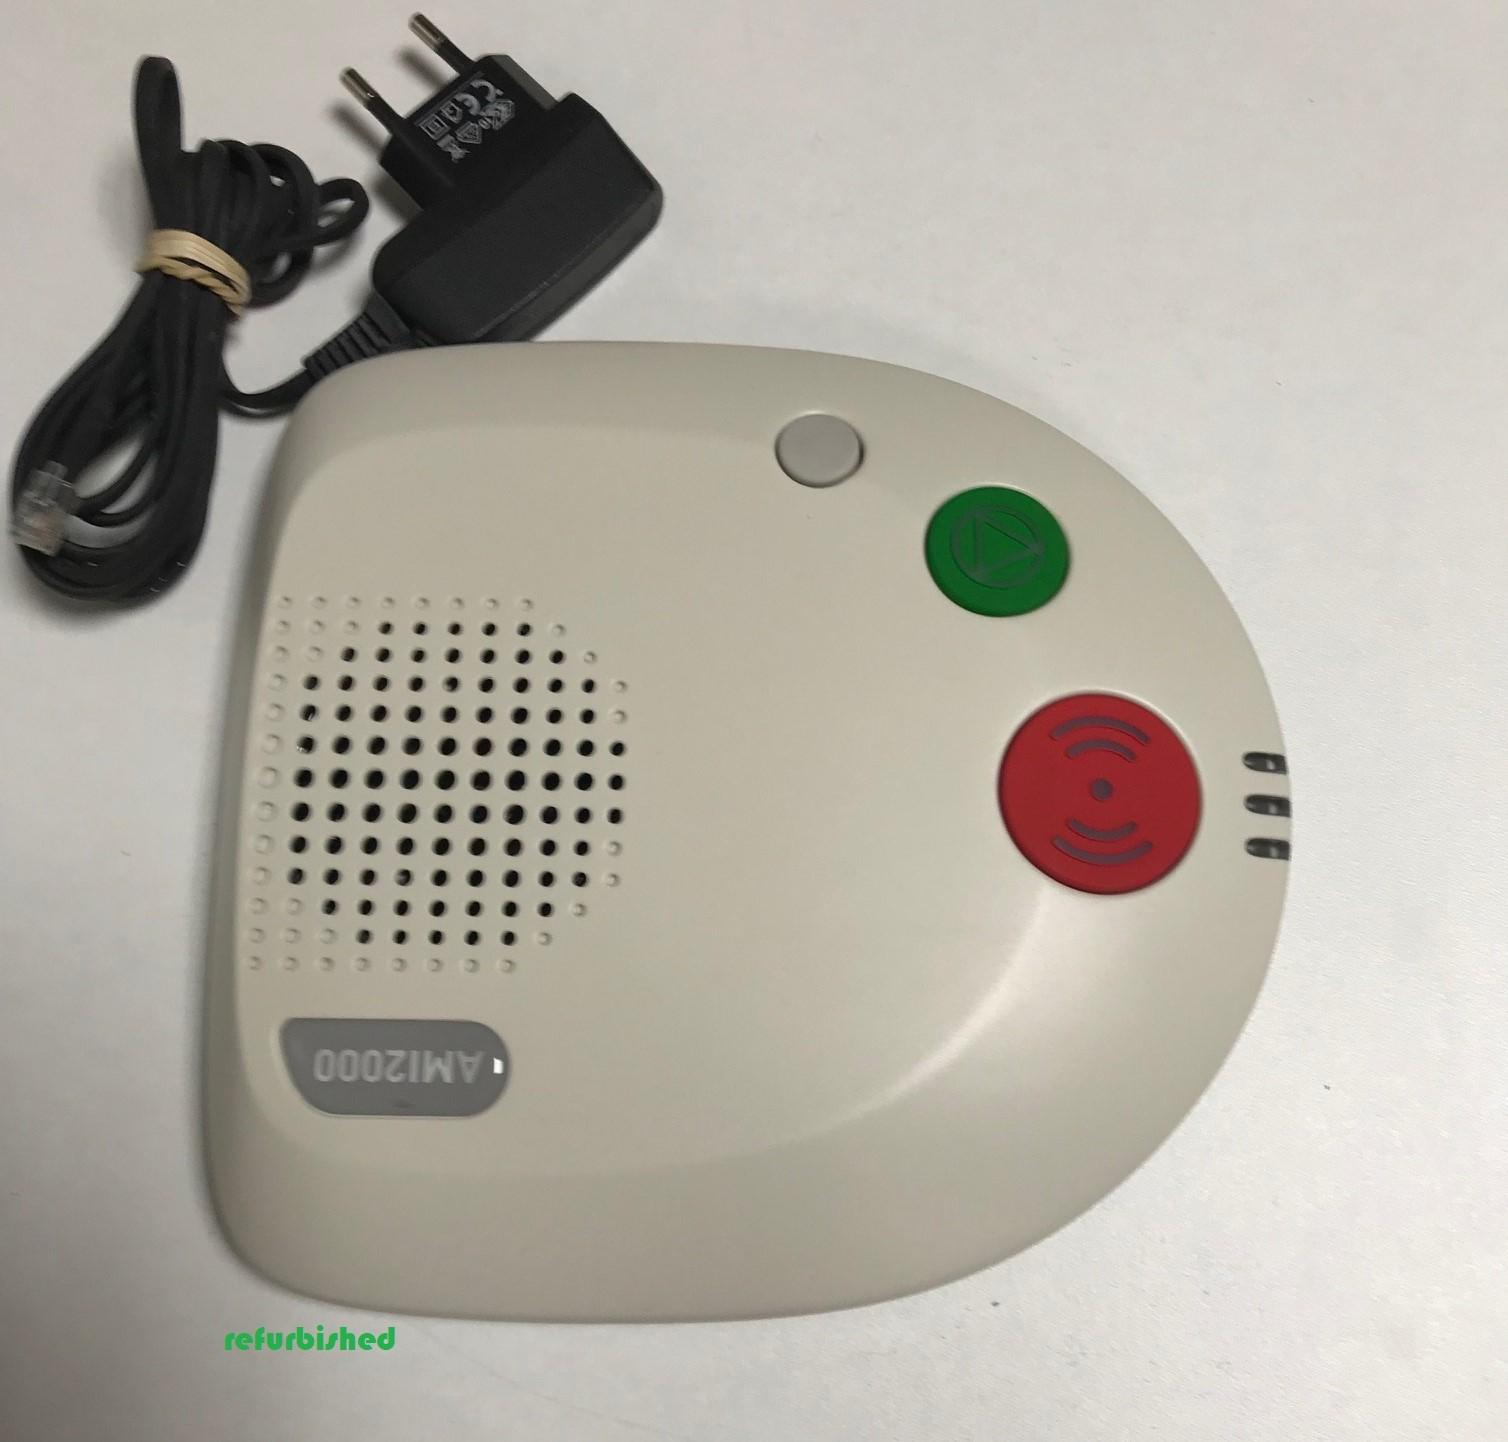 AMI2000 alarmeringstoestel